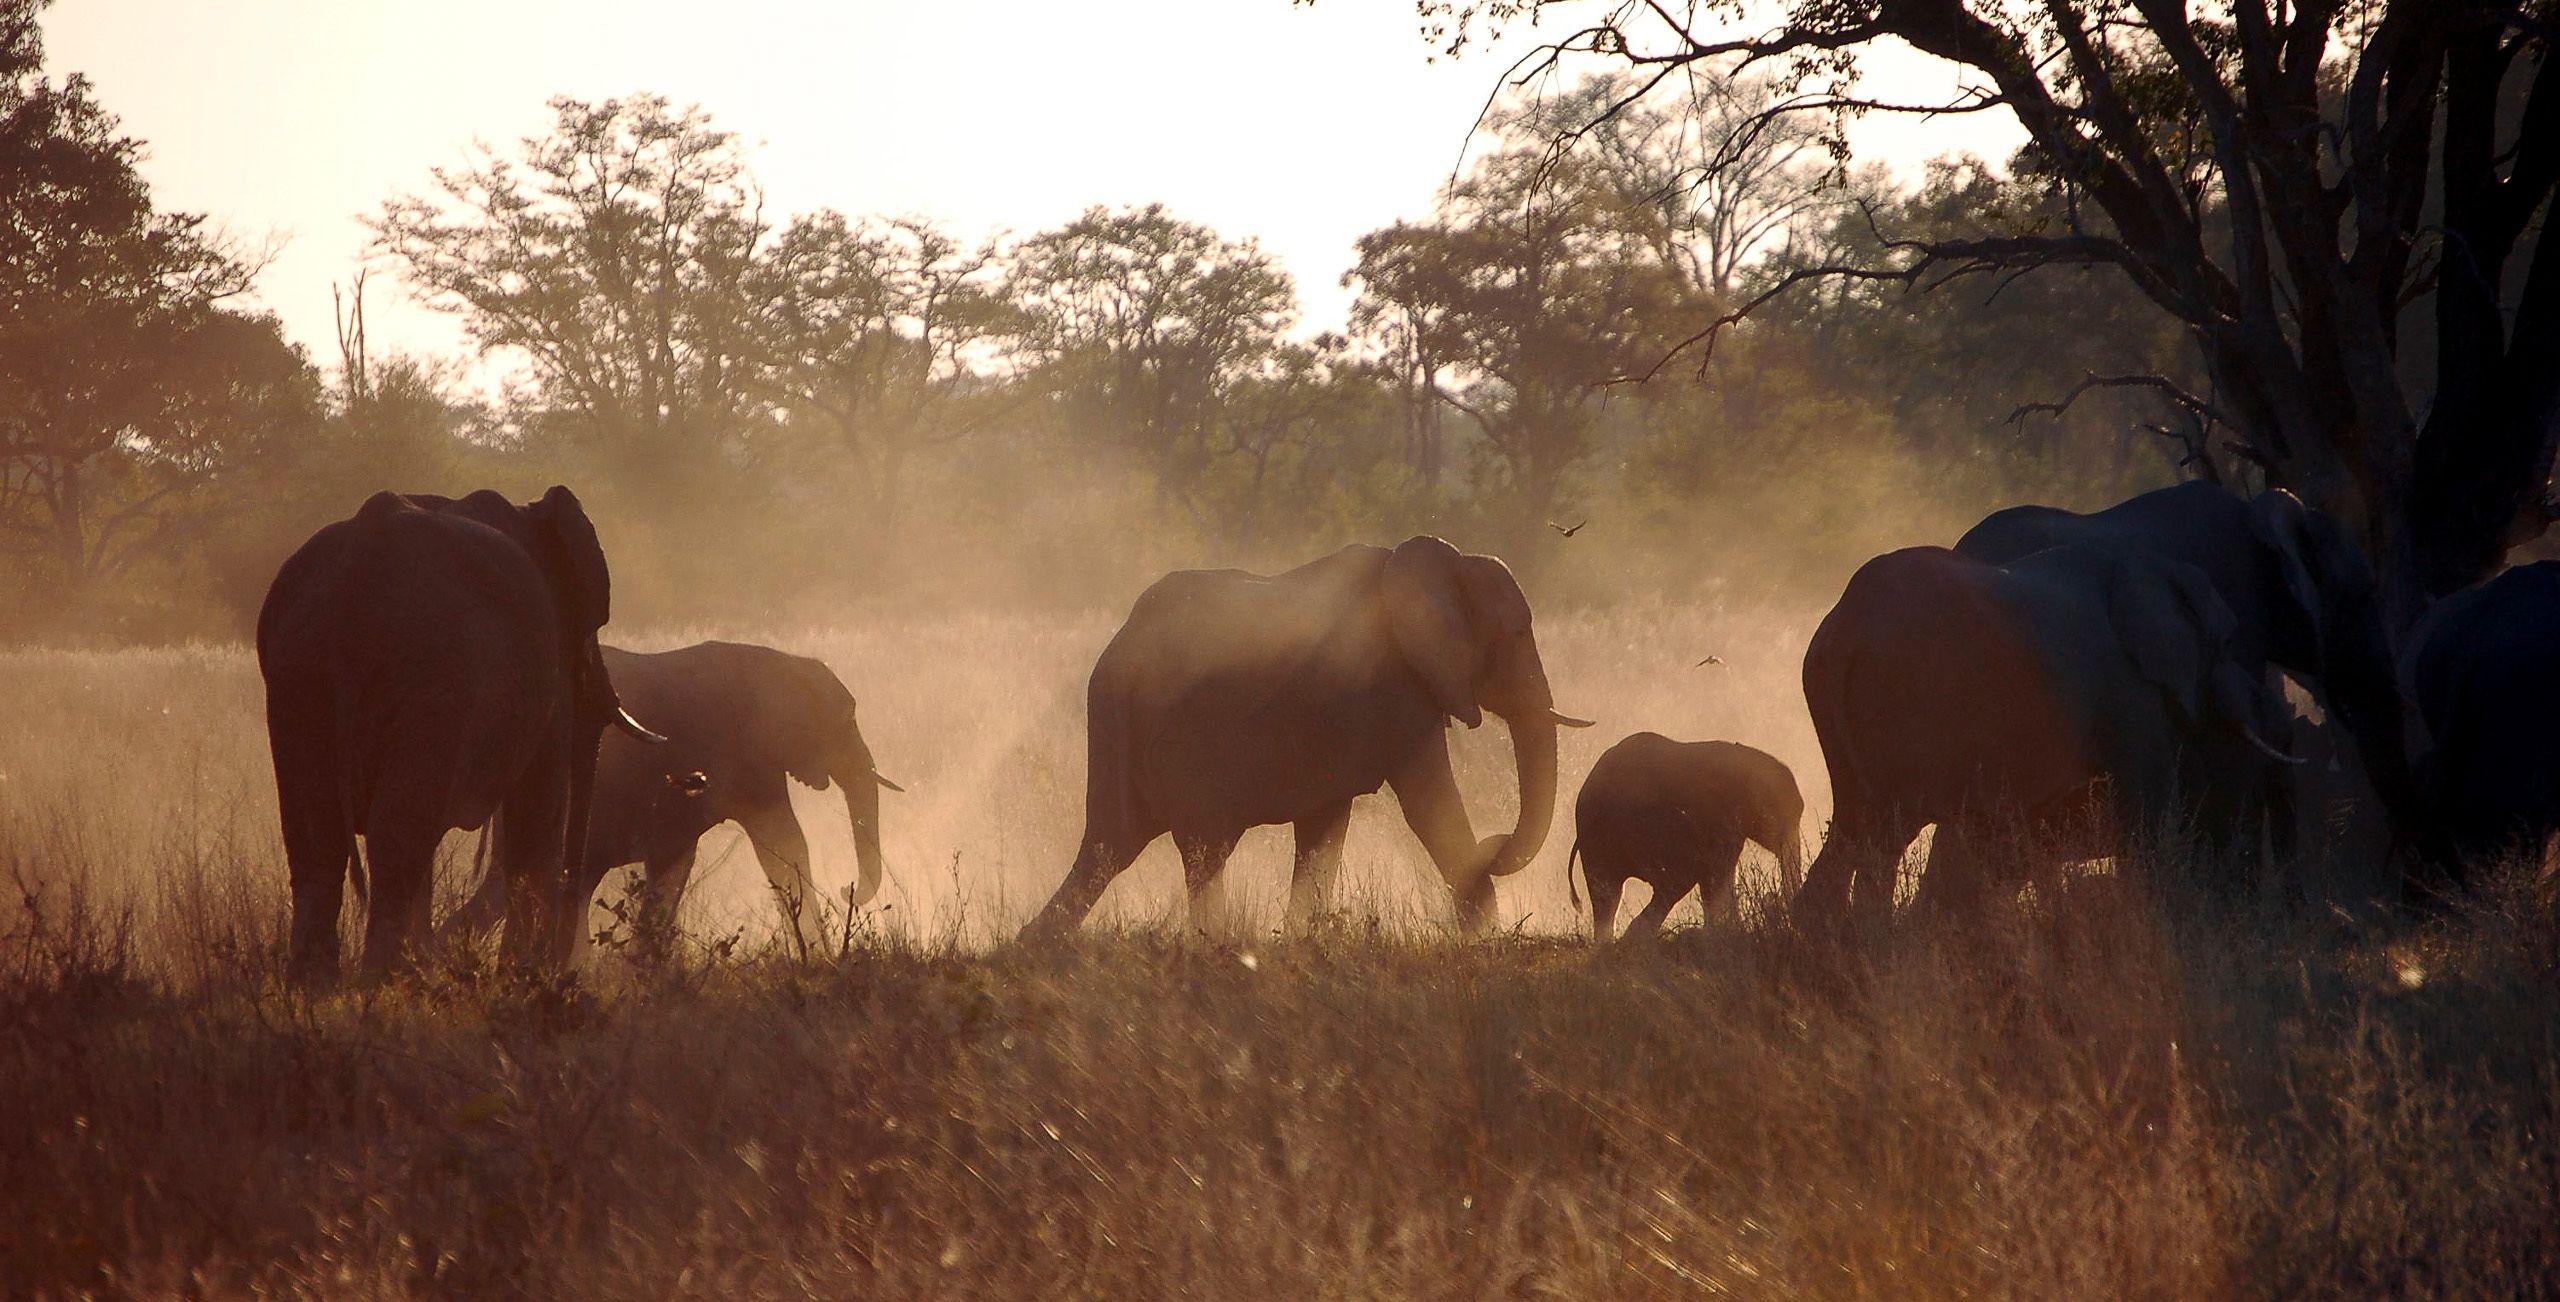 botswana_elephants_dusk_travelling.jpg